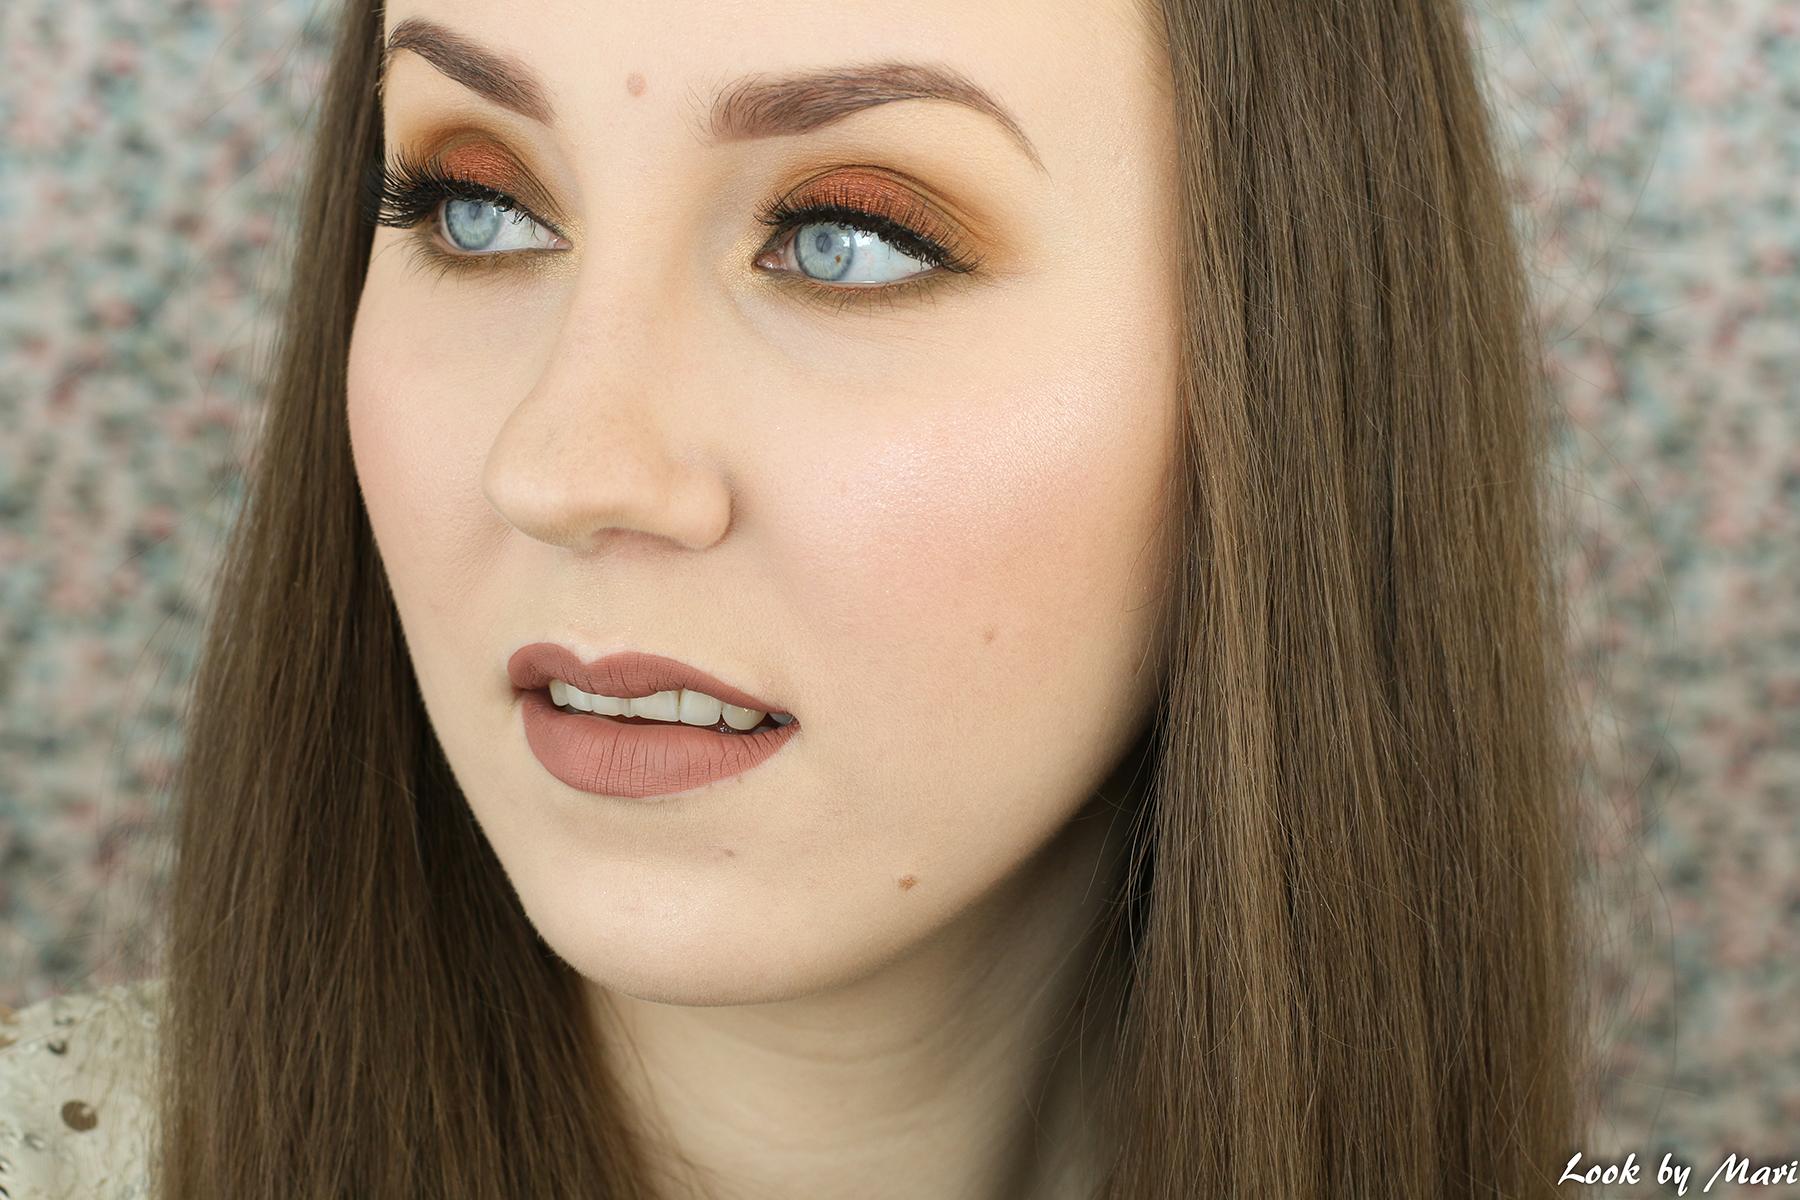 9 eylure volume n'100 false lashes review tekoripset kokemuksia silmämeikki